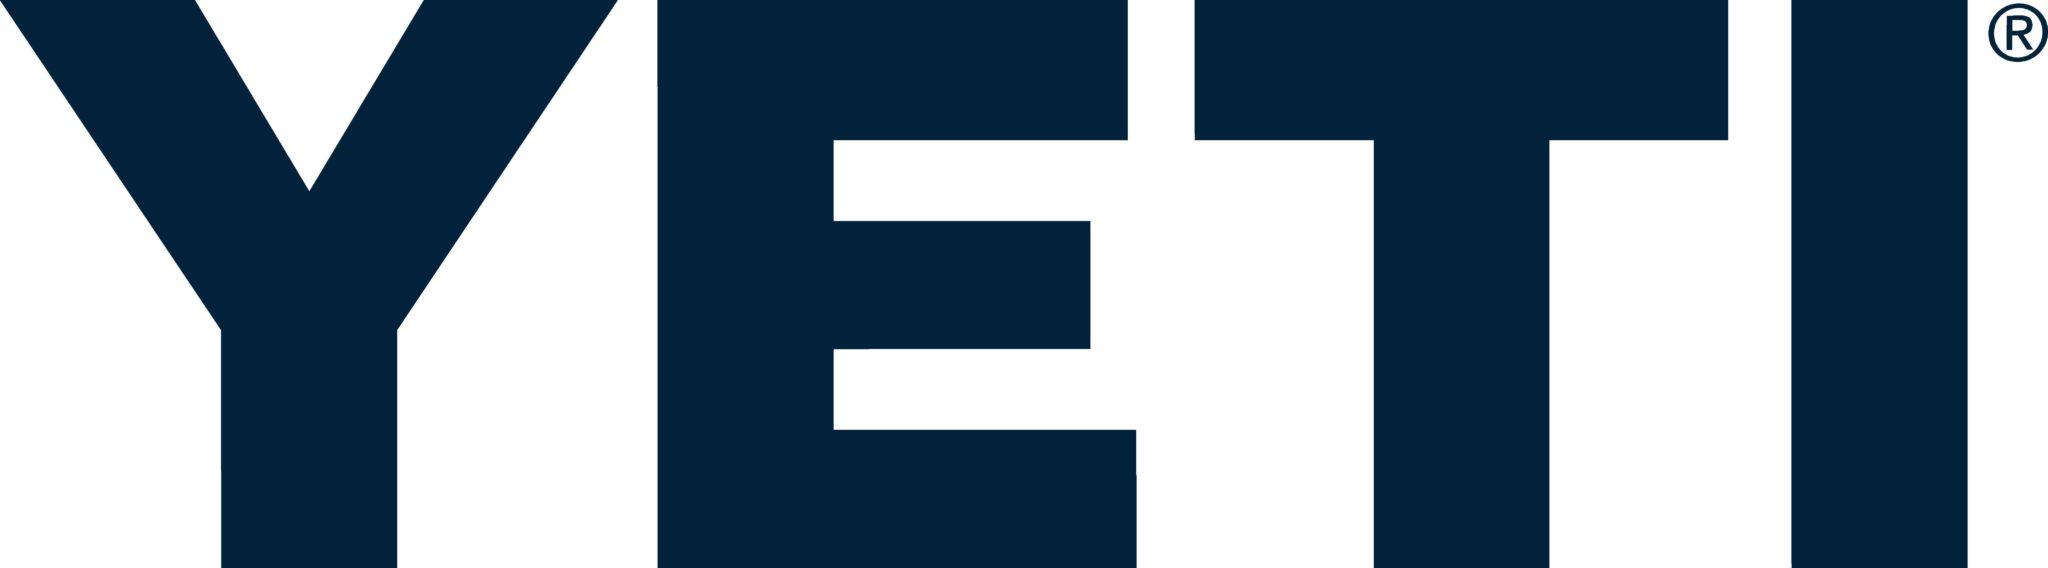 AmberFest - Texas Center for the Missing |Blue Yeti Logo